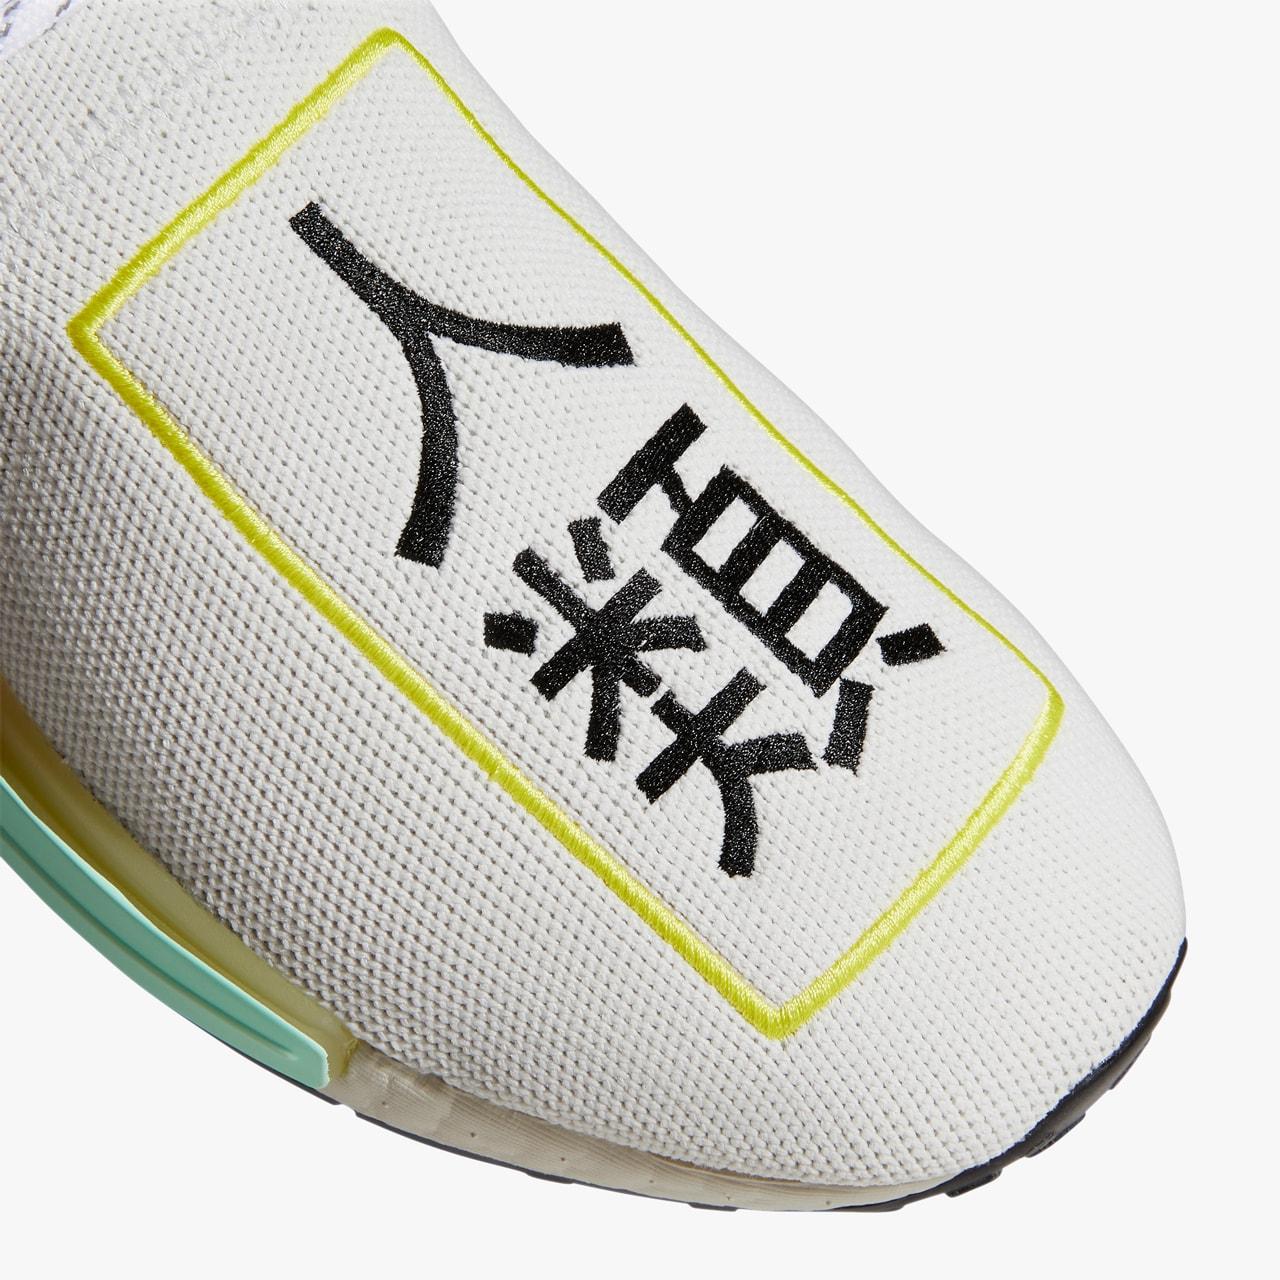 Pharrell Williams x adidas NMD Hu 全新聯名系列「Human Race」正式發佈